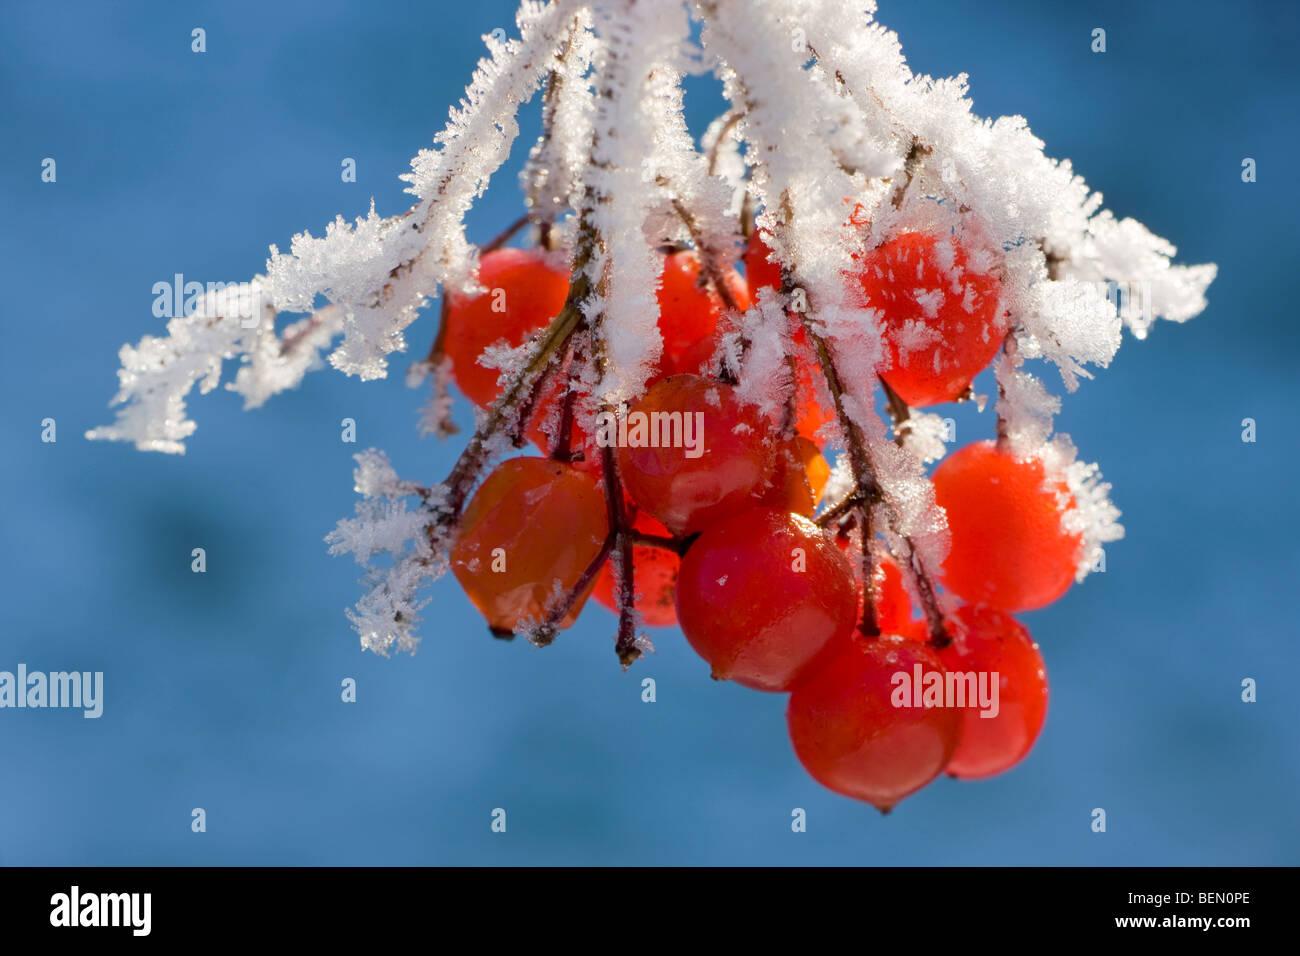 Guelder Rose / Water Elder / Cramp Bark / Snowbell Tree (Viburnum opulus) red berries covered in hoarfrost in winter - Stock Image